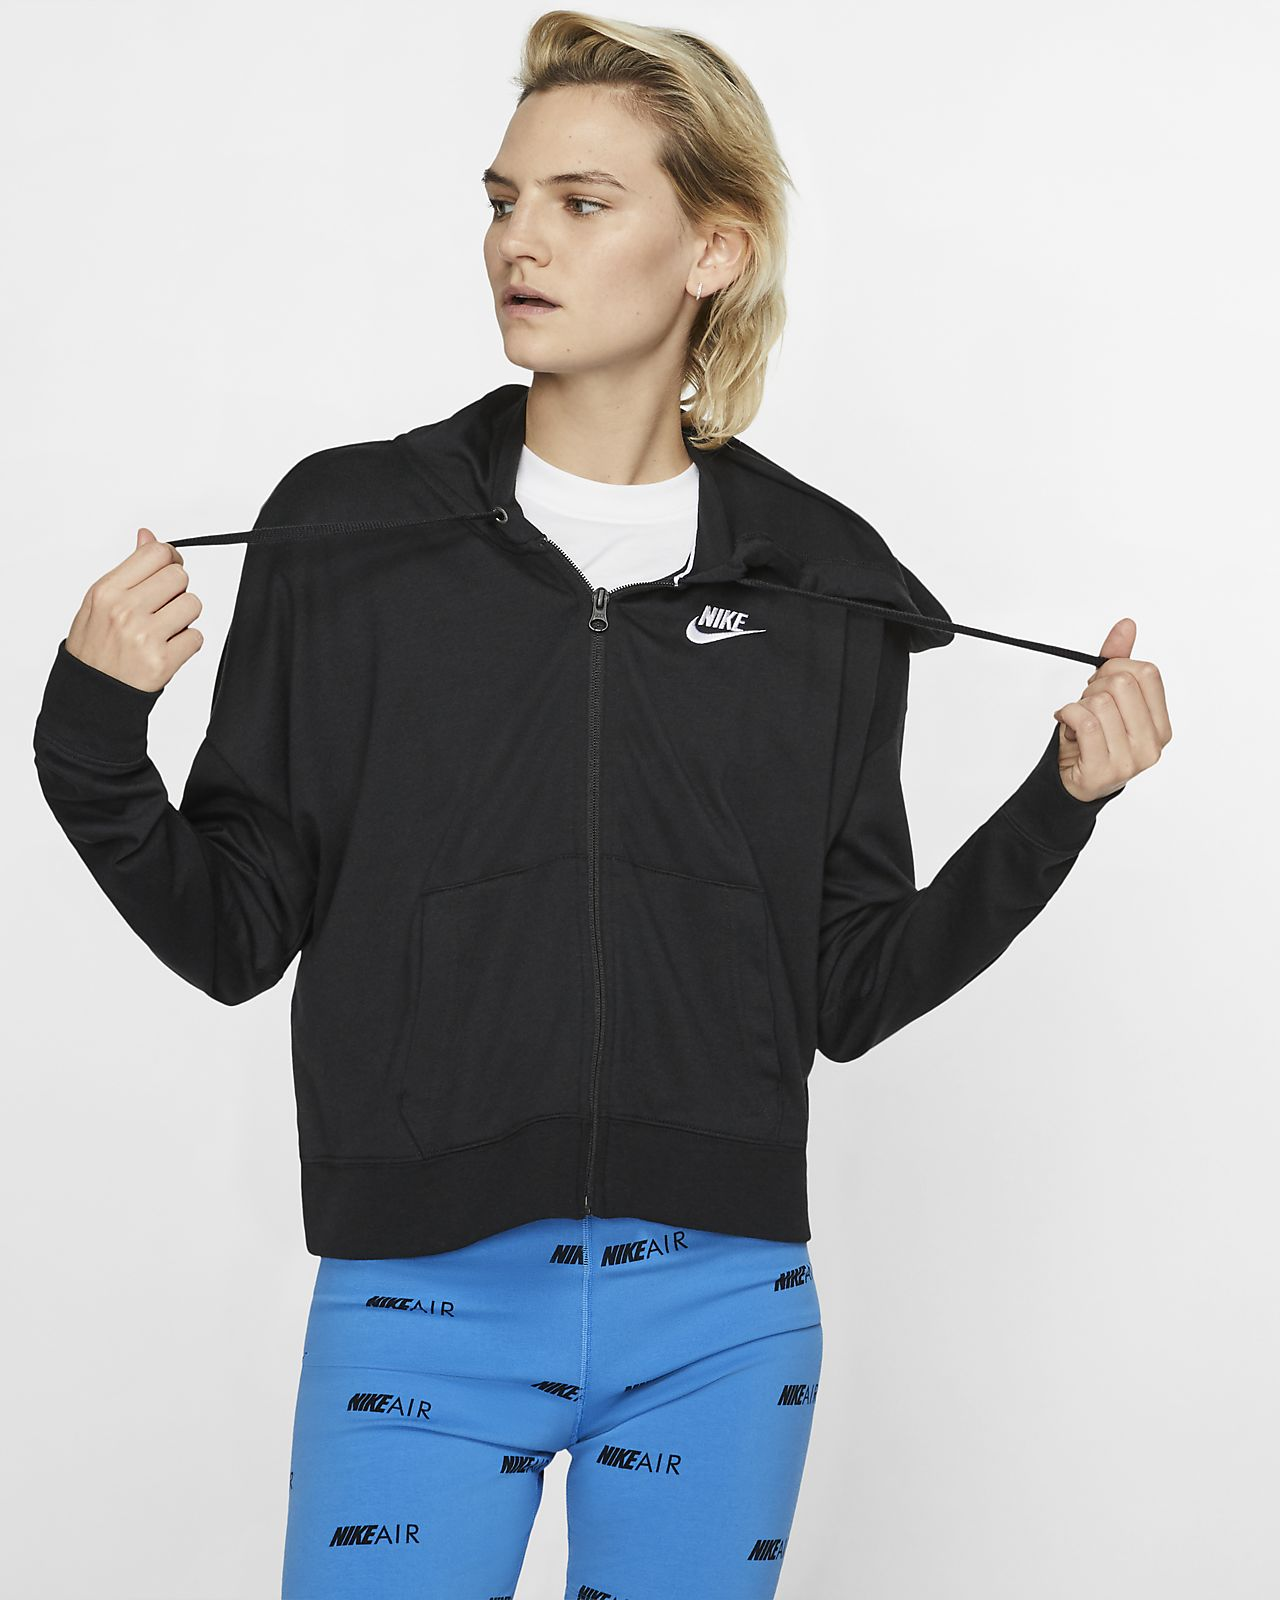 Nike Sportswear Dessuadora amb caputxa i cremallera completa - Dona